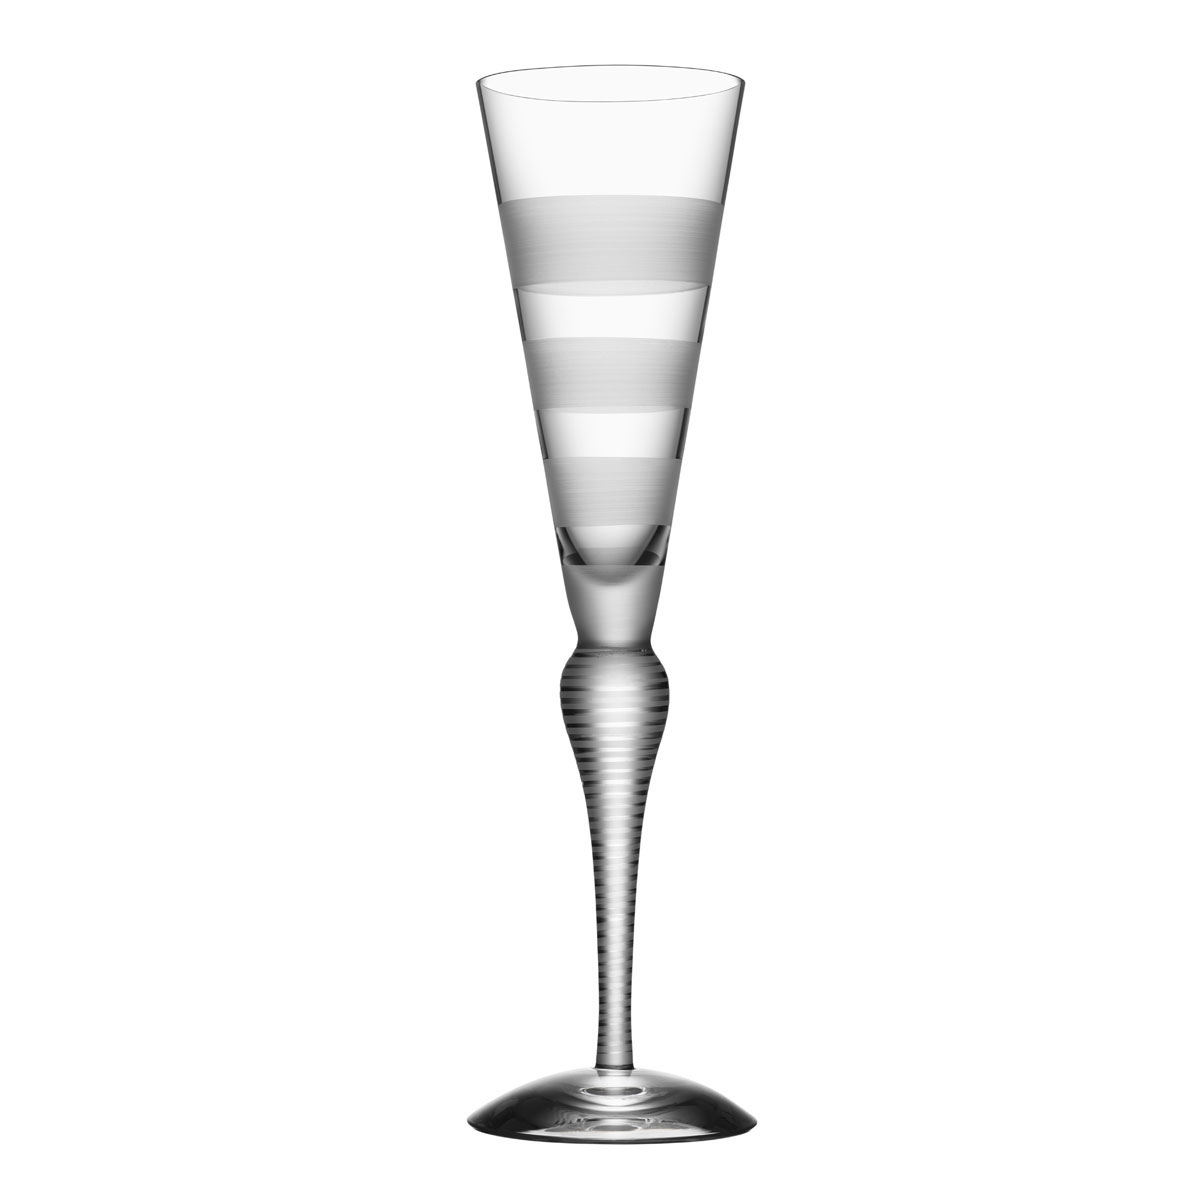 Orrefors Clown Champagne Flute Single, Frost Stripes